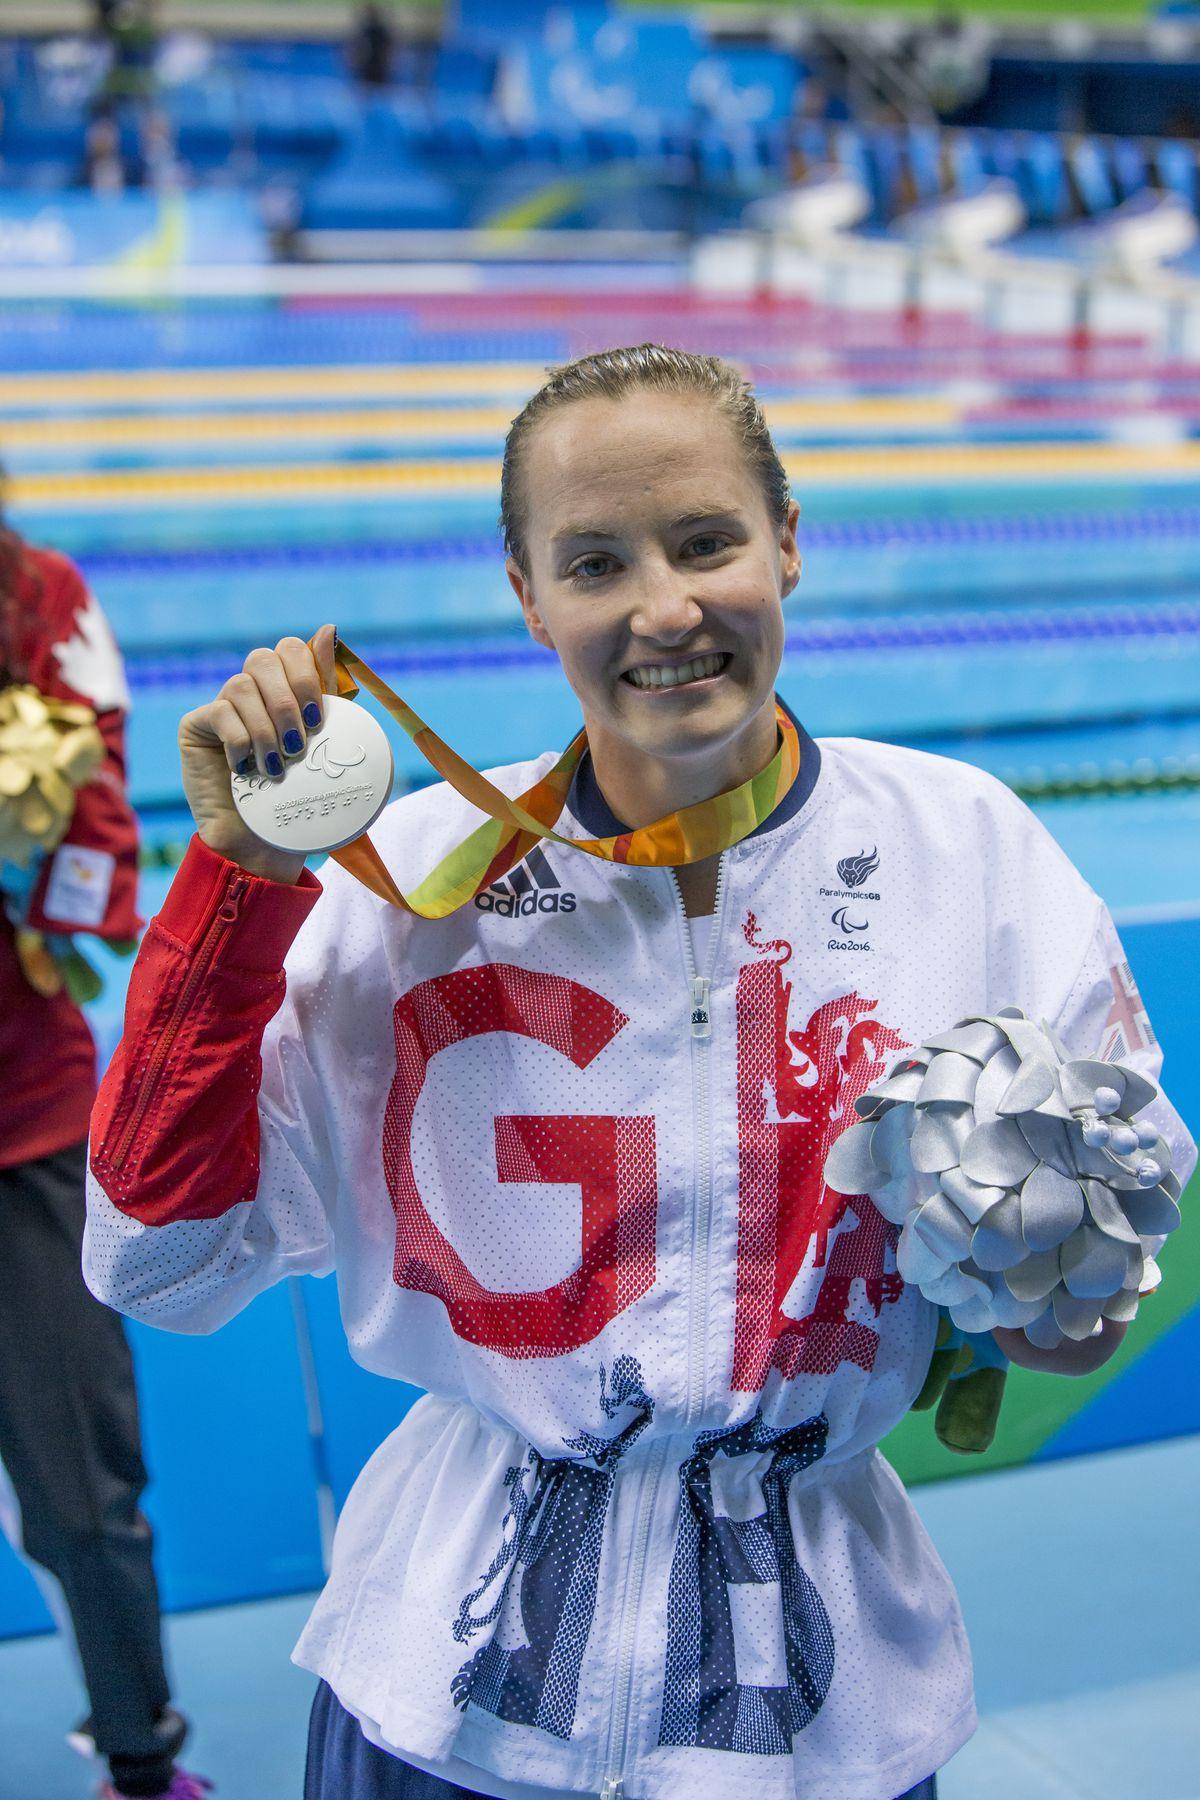 Claire Cashmore (Photo: OnEdition)